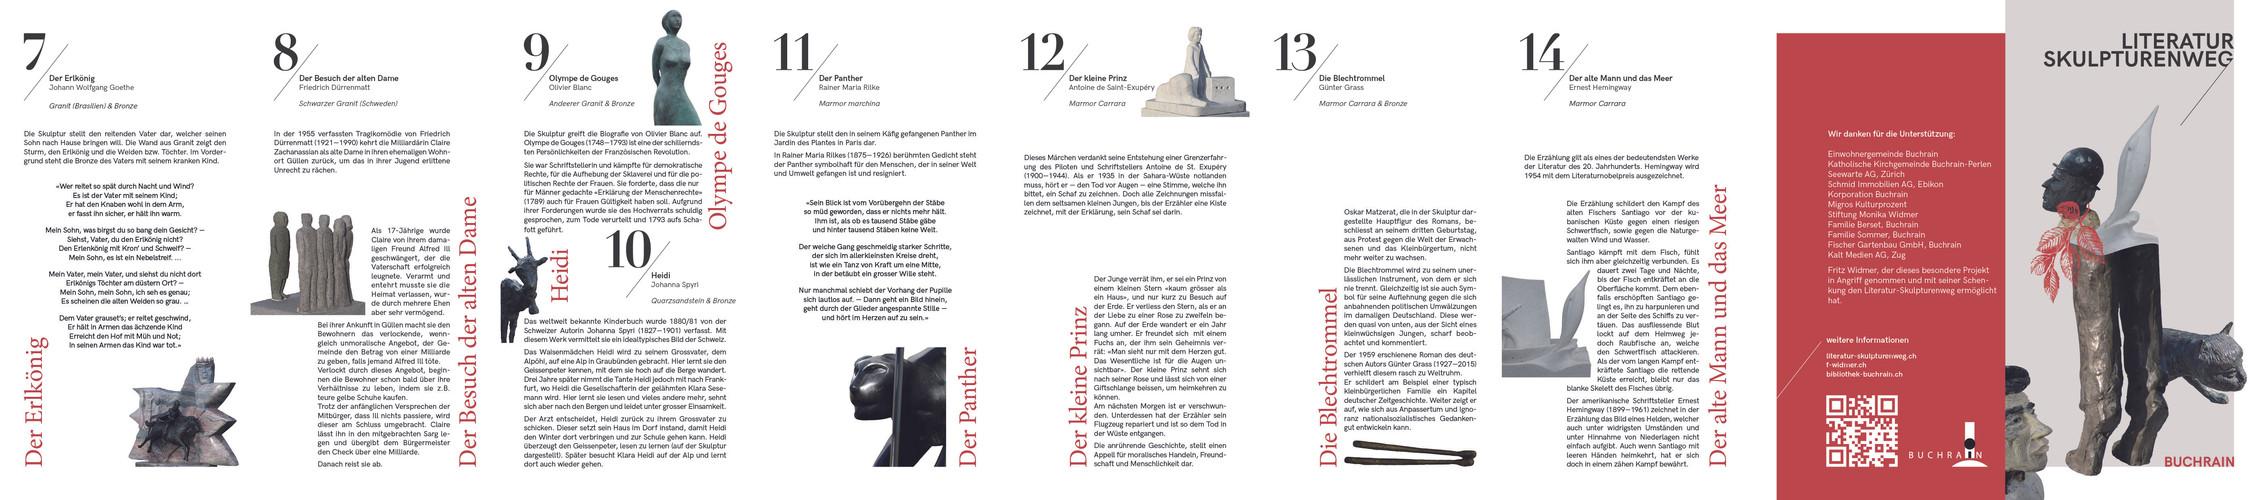 LITERATUR- & SKULTURENWEG BUCHRAIN